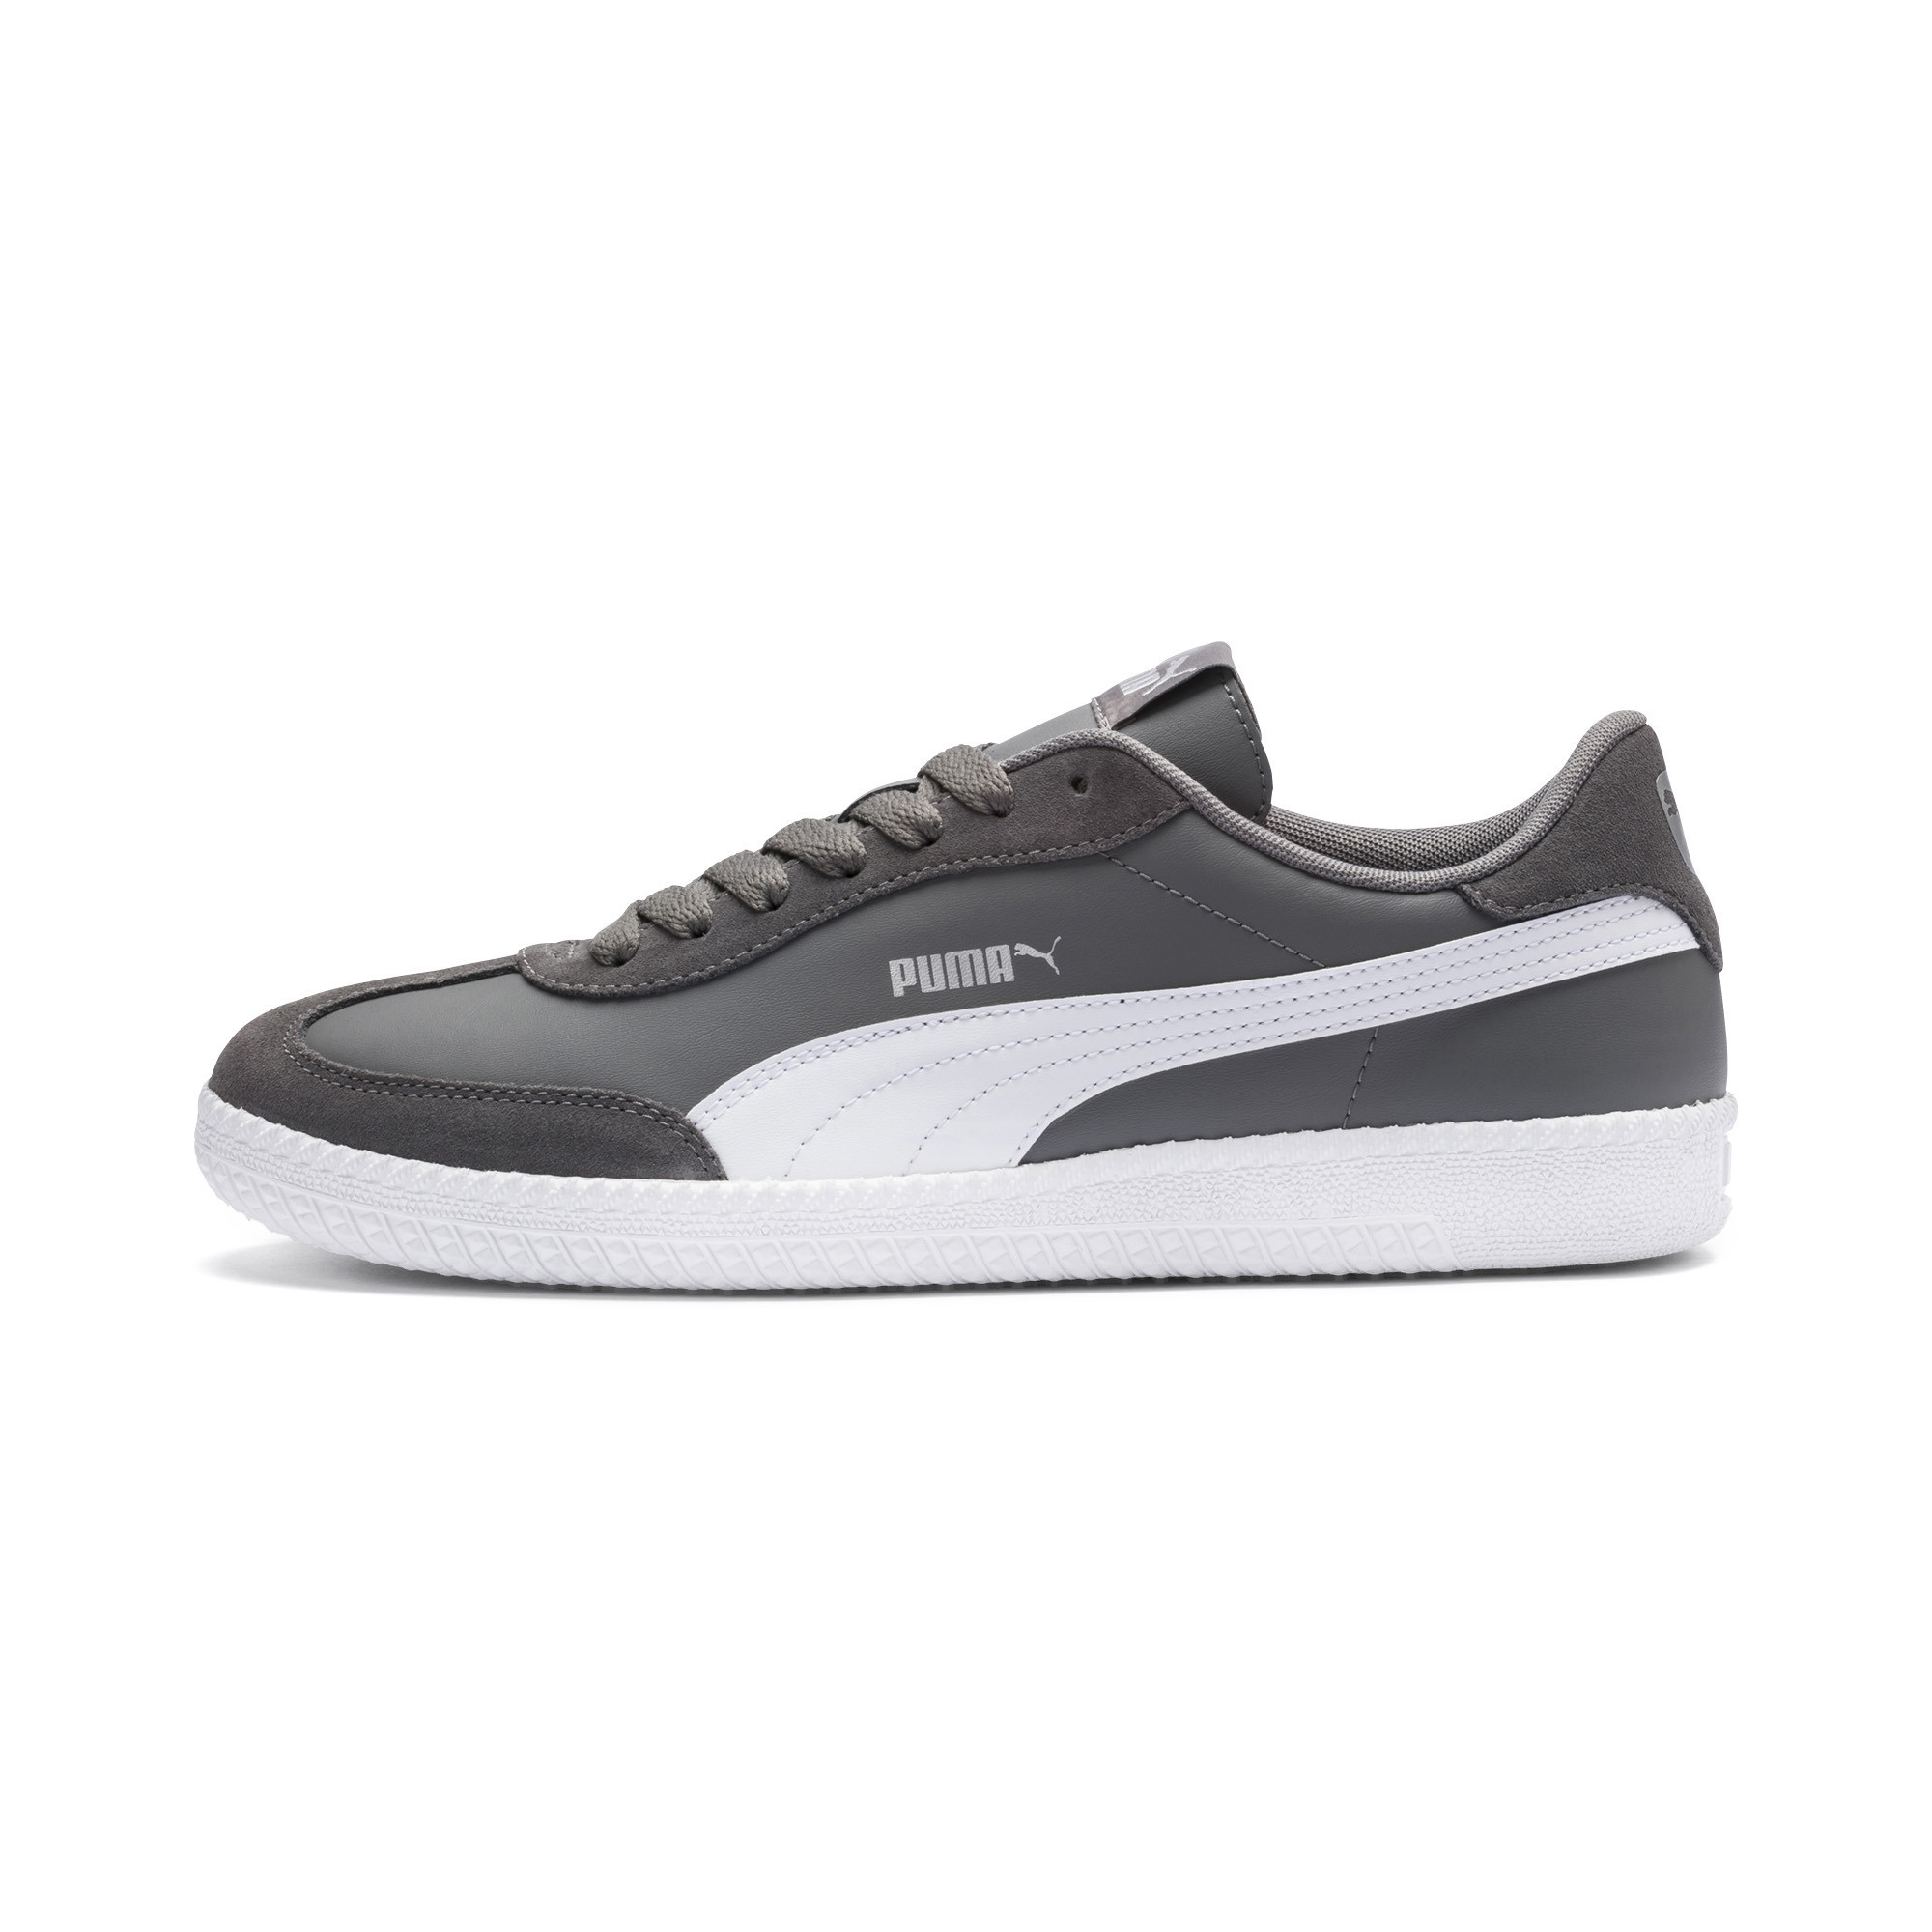 PUMA-Astro-Cup-Men-039-s-Sneakers-Men-Shoe-Basics thumbnail 21